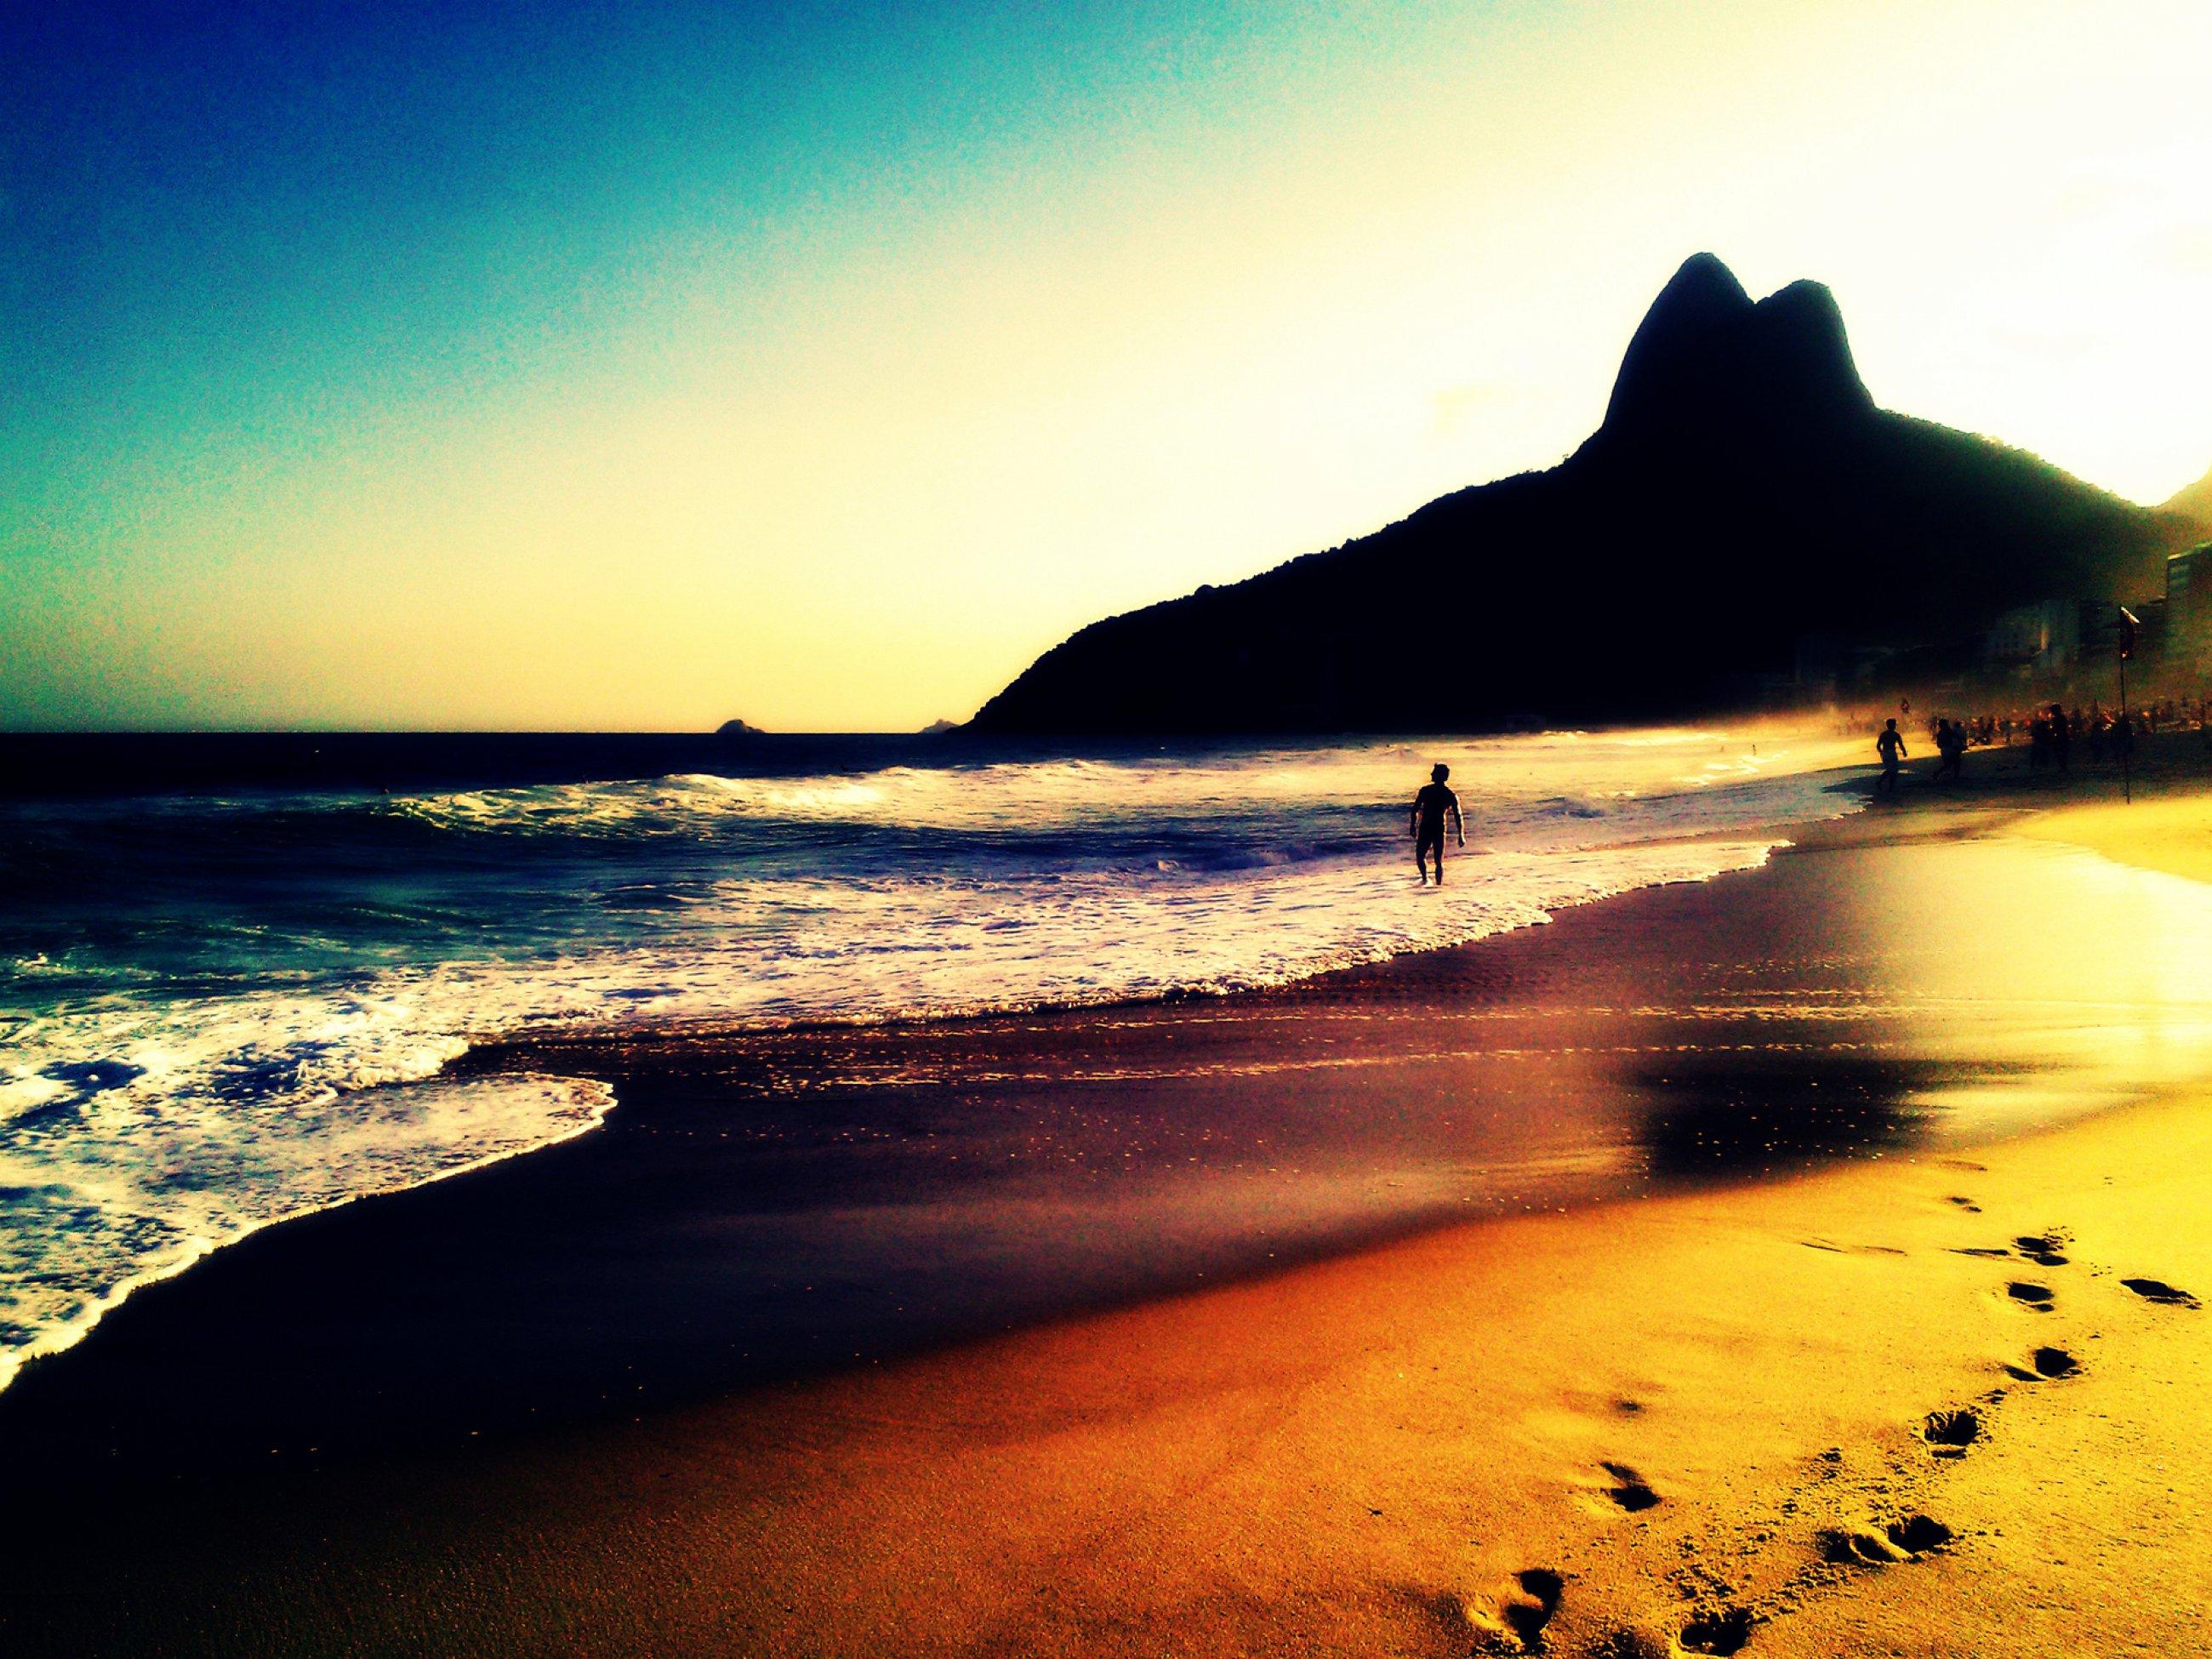 https://bubo.sk/uploads/galleries/5019/rio-ipanema-e-morro-dois-irmos-08.jpg